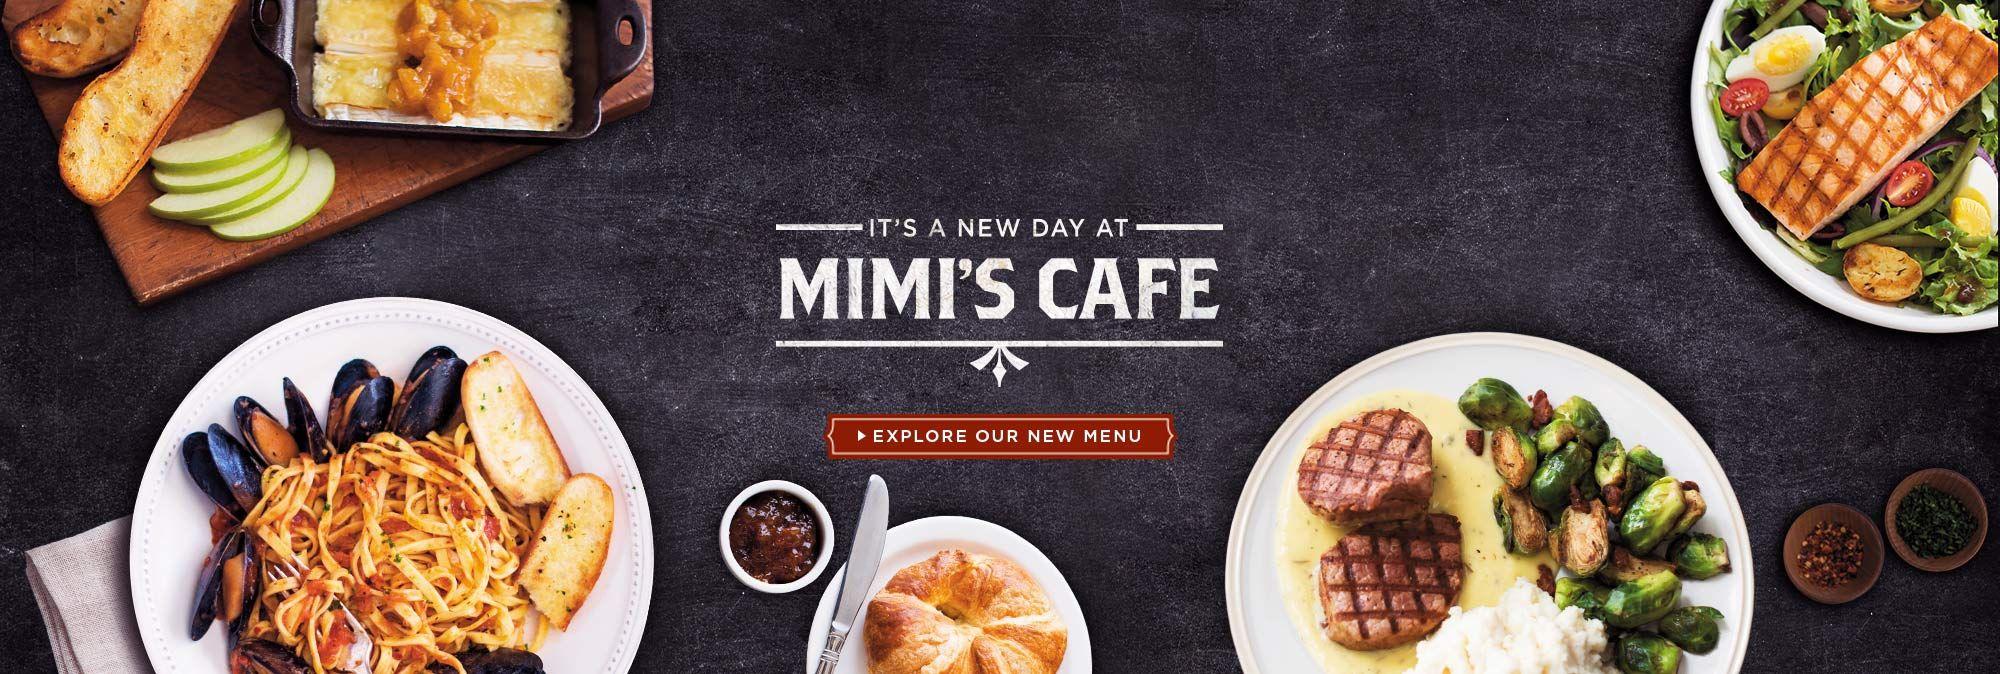 Mimi S Cafe Northridge Best Corned Beef Hash In The World Best Corned Beef Hash Corned Beef Hash Fresh Food